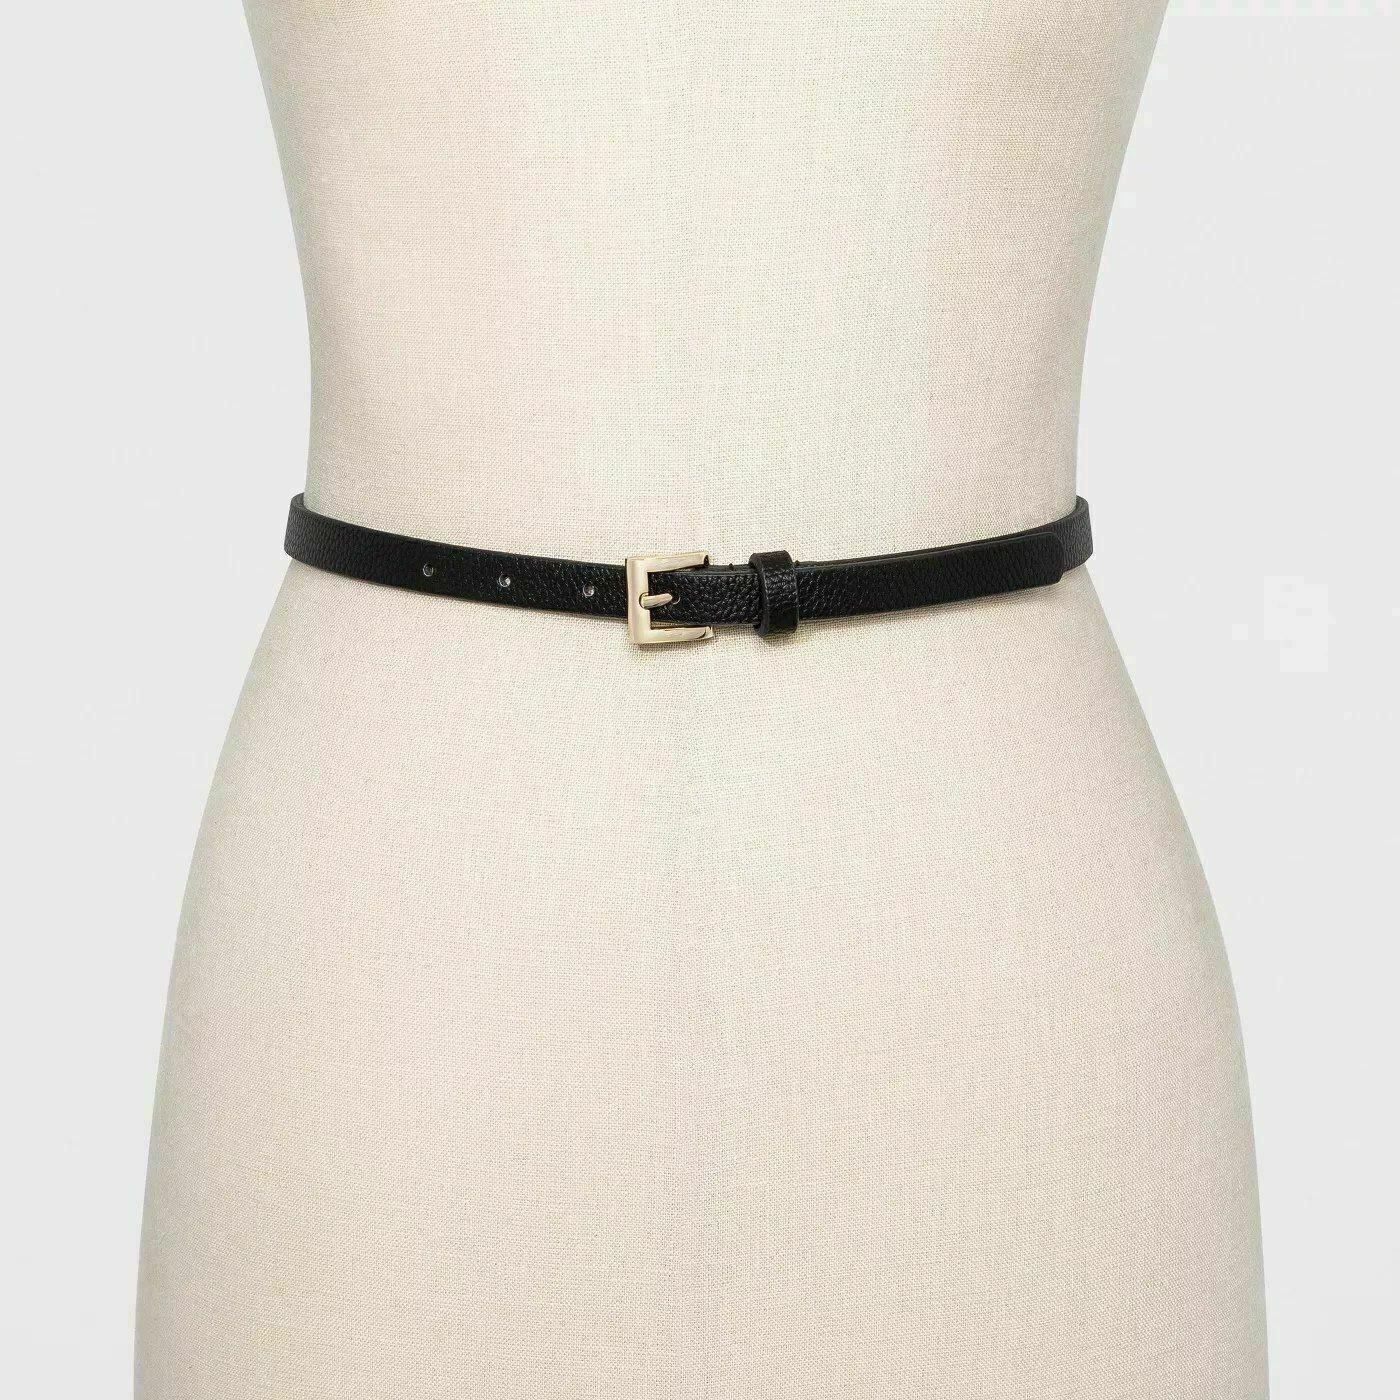 Women's Reversible Belts – A New Day Black XL, Belts